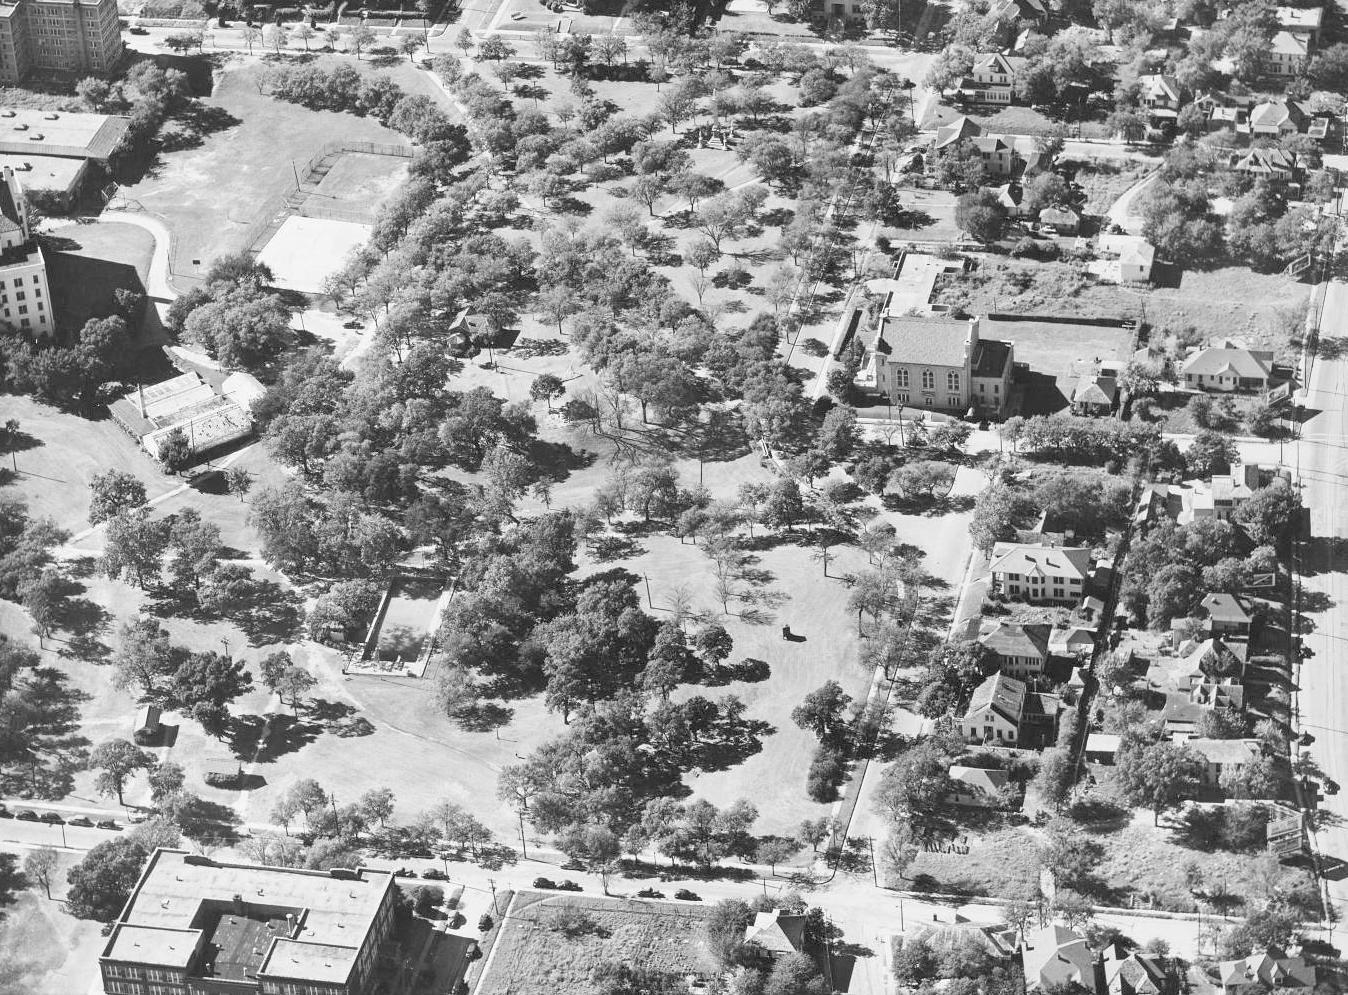 1948_city-park_aerial_dallas-municipal-archives_portal